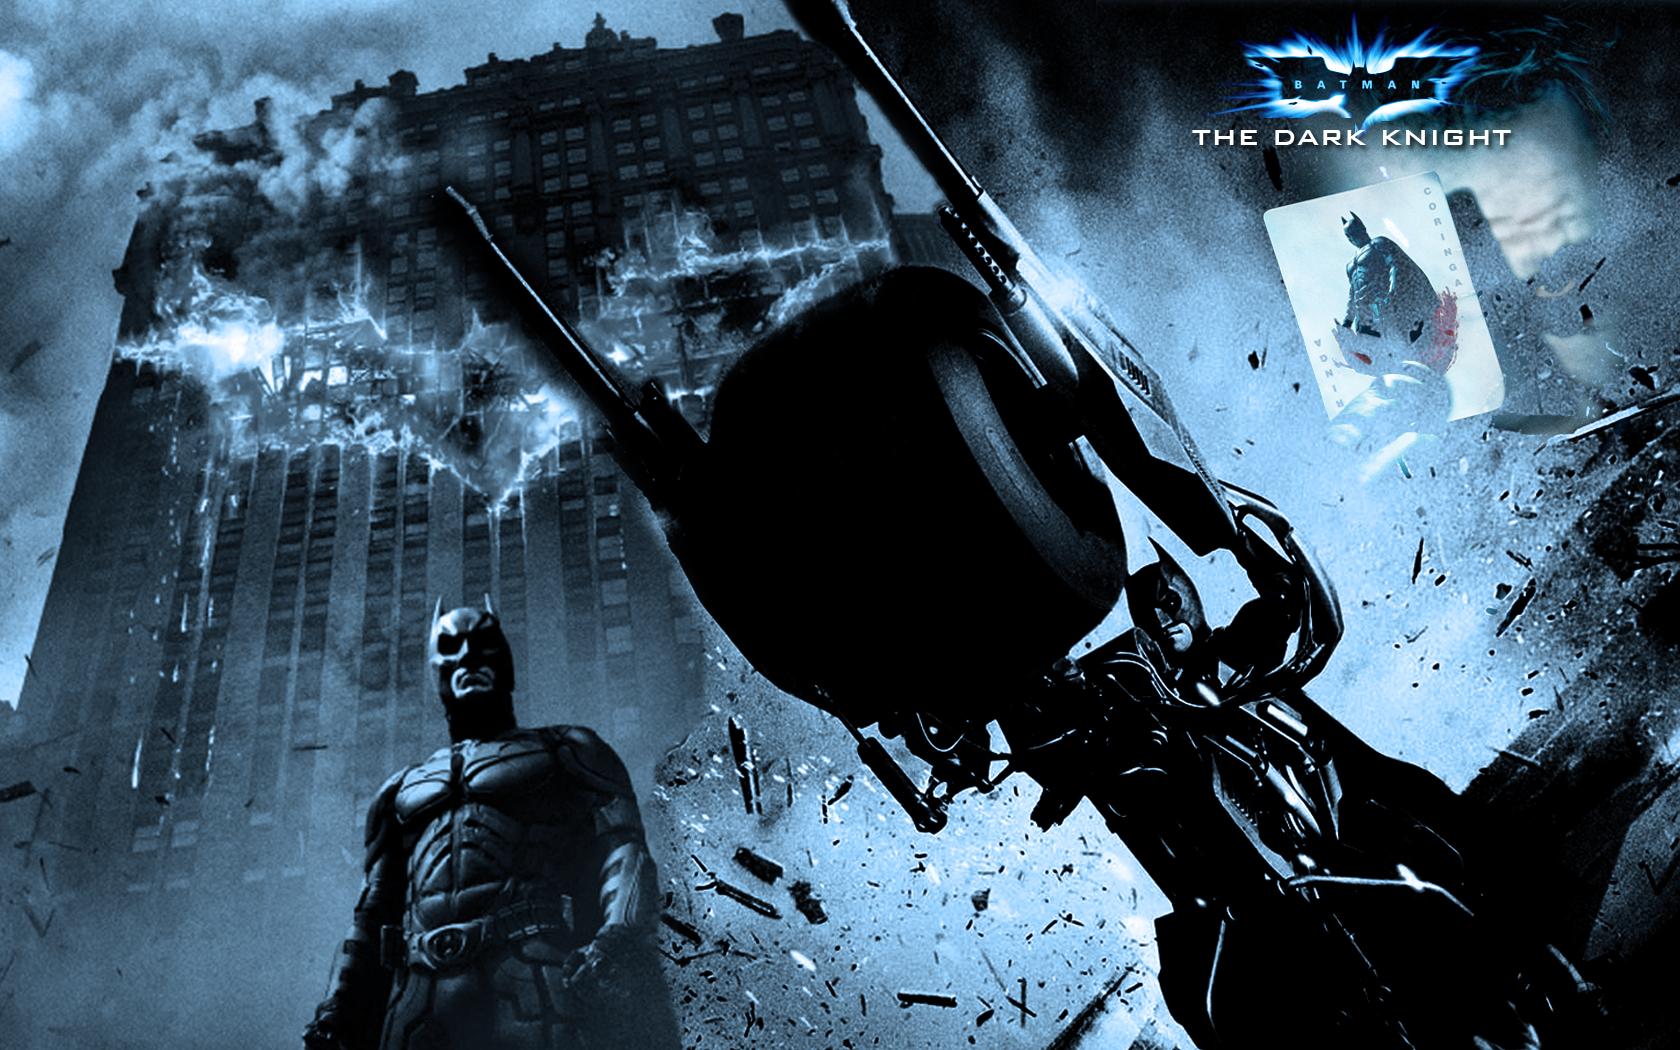 Joker hd wallpapers 1080p